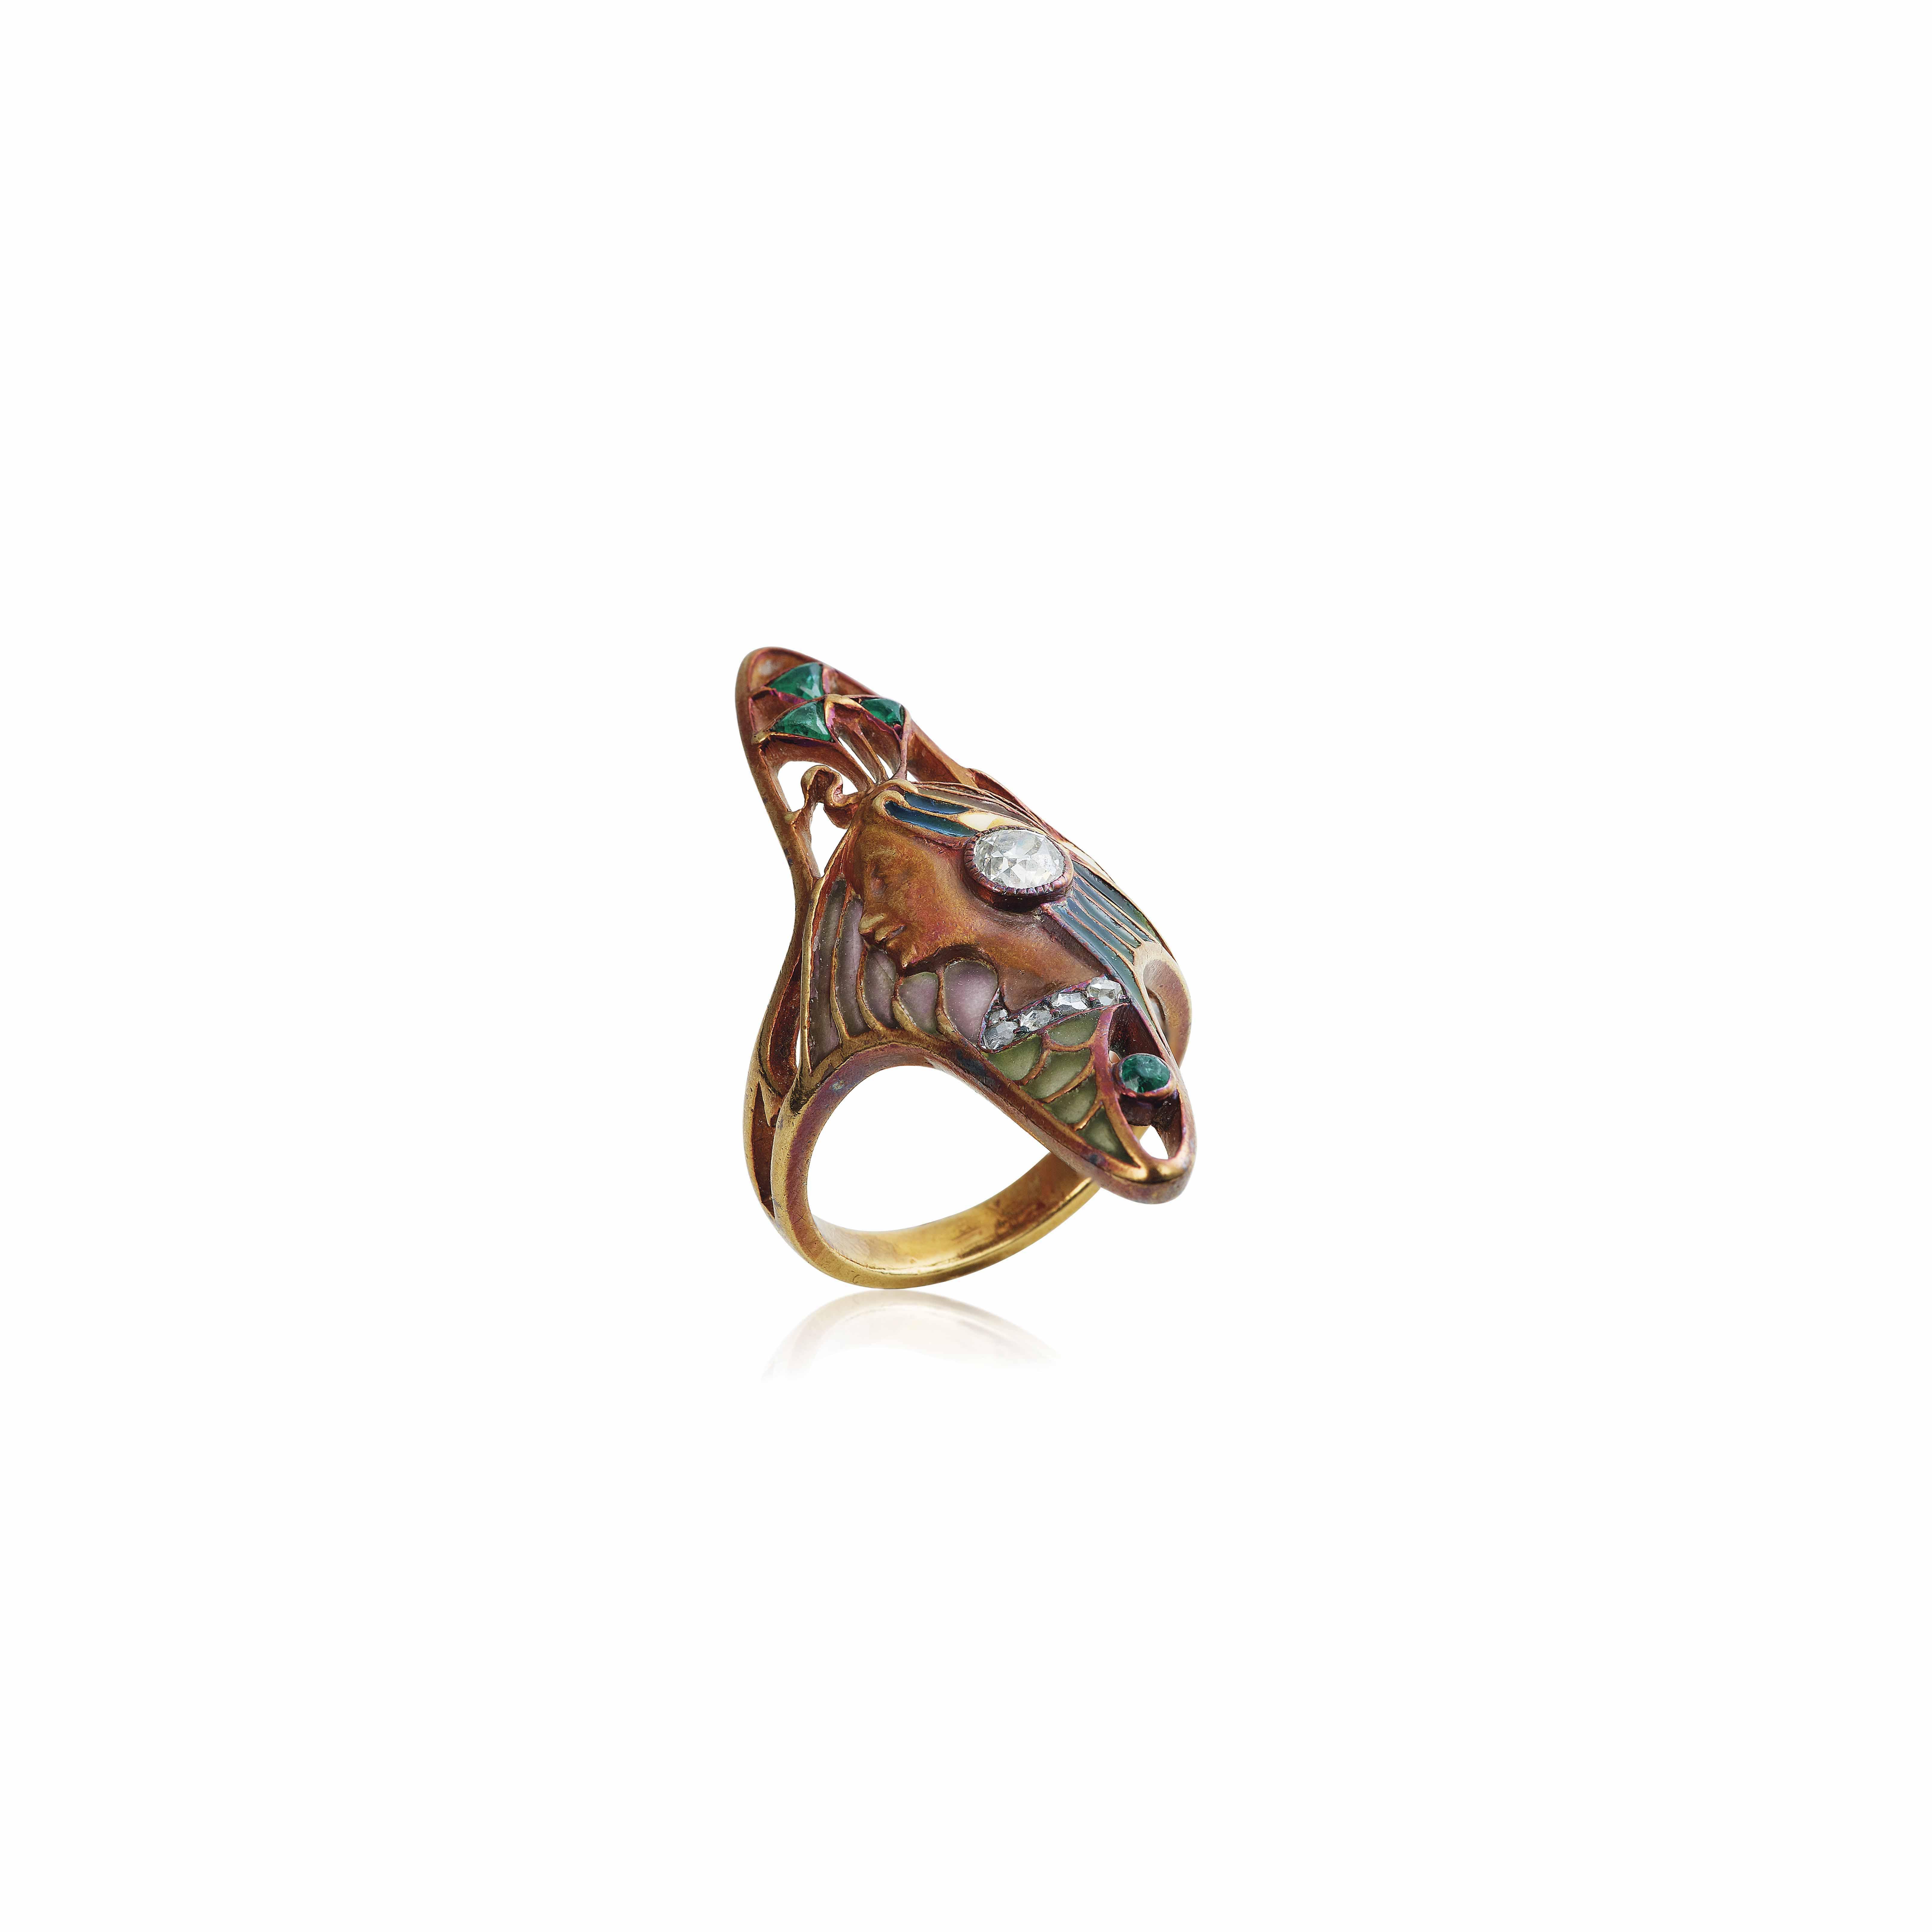 AN ART NOUVEAU ENAMEL, DIAMOND AND EMERALD RING, BY LÉOPOLD GAUTRAIT